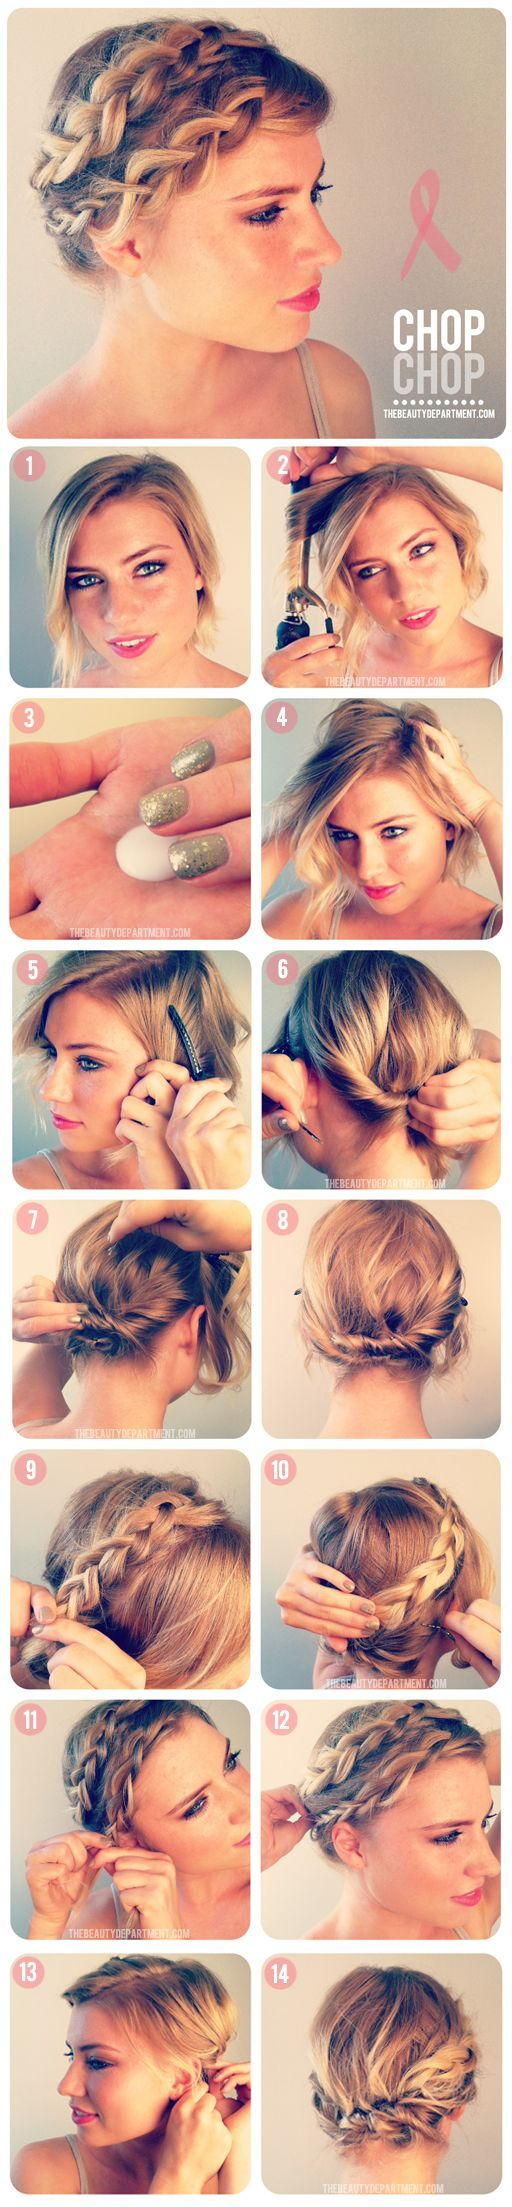 15 Sassy Hairstyle Tutorials for Short or Medium Hair - Pretty Designs